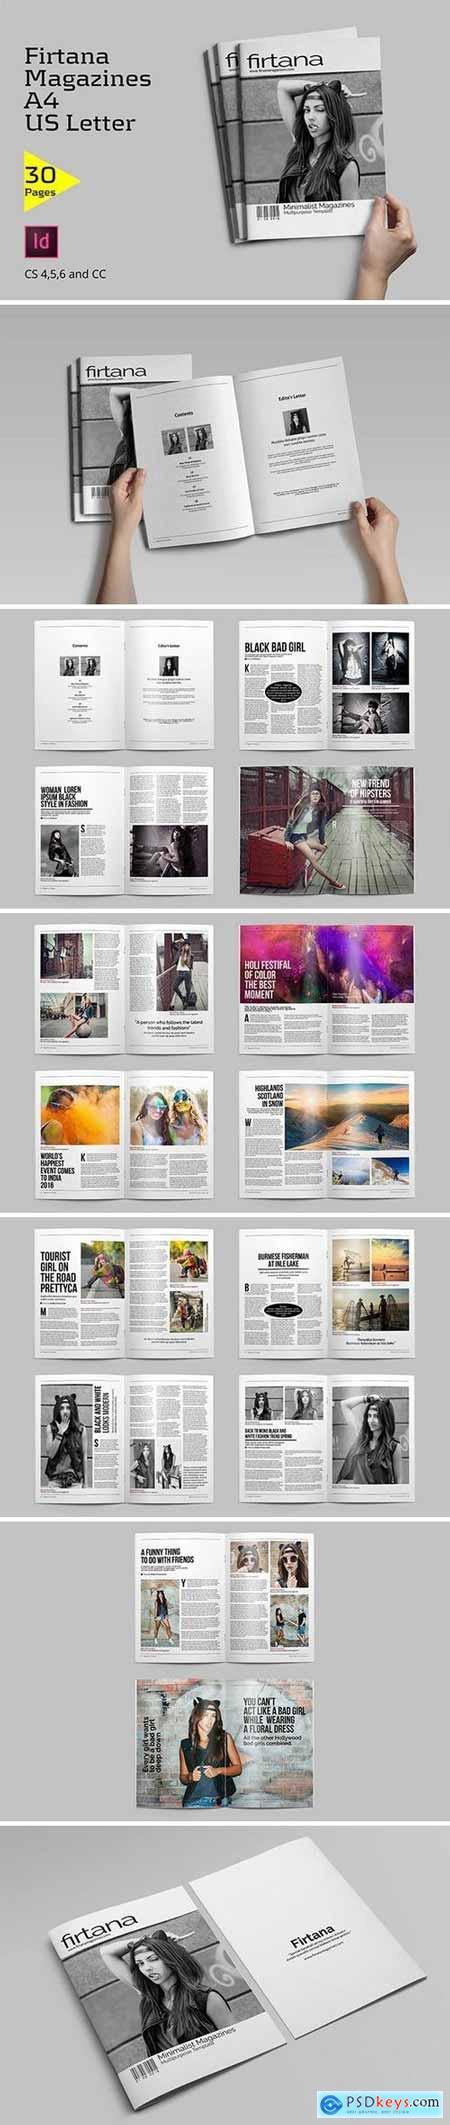 Creativemarket Firtana Magazines